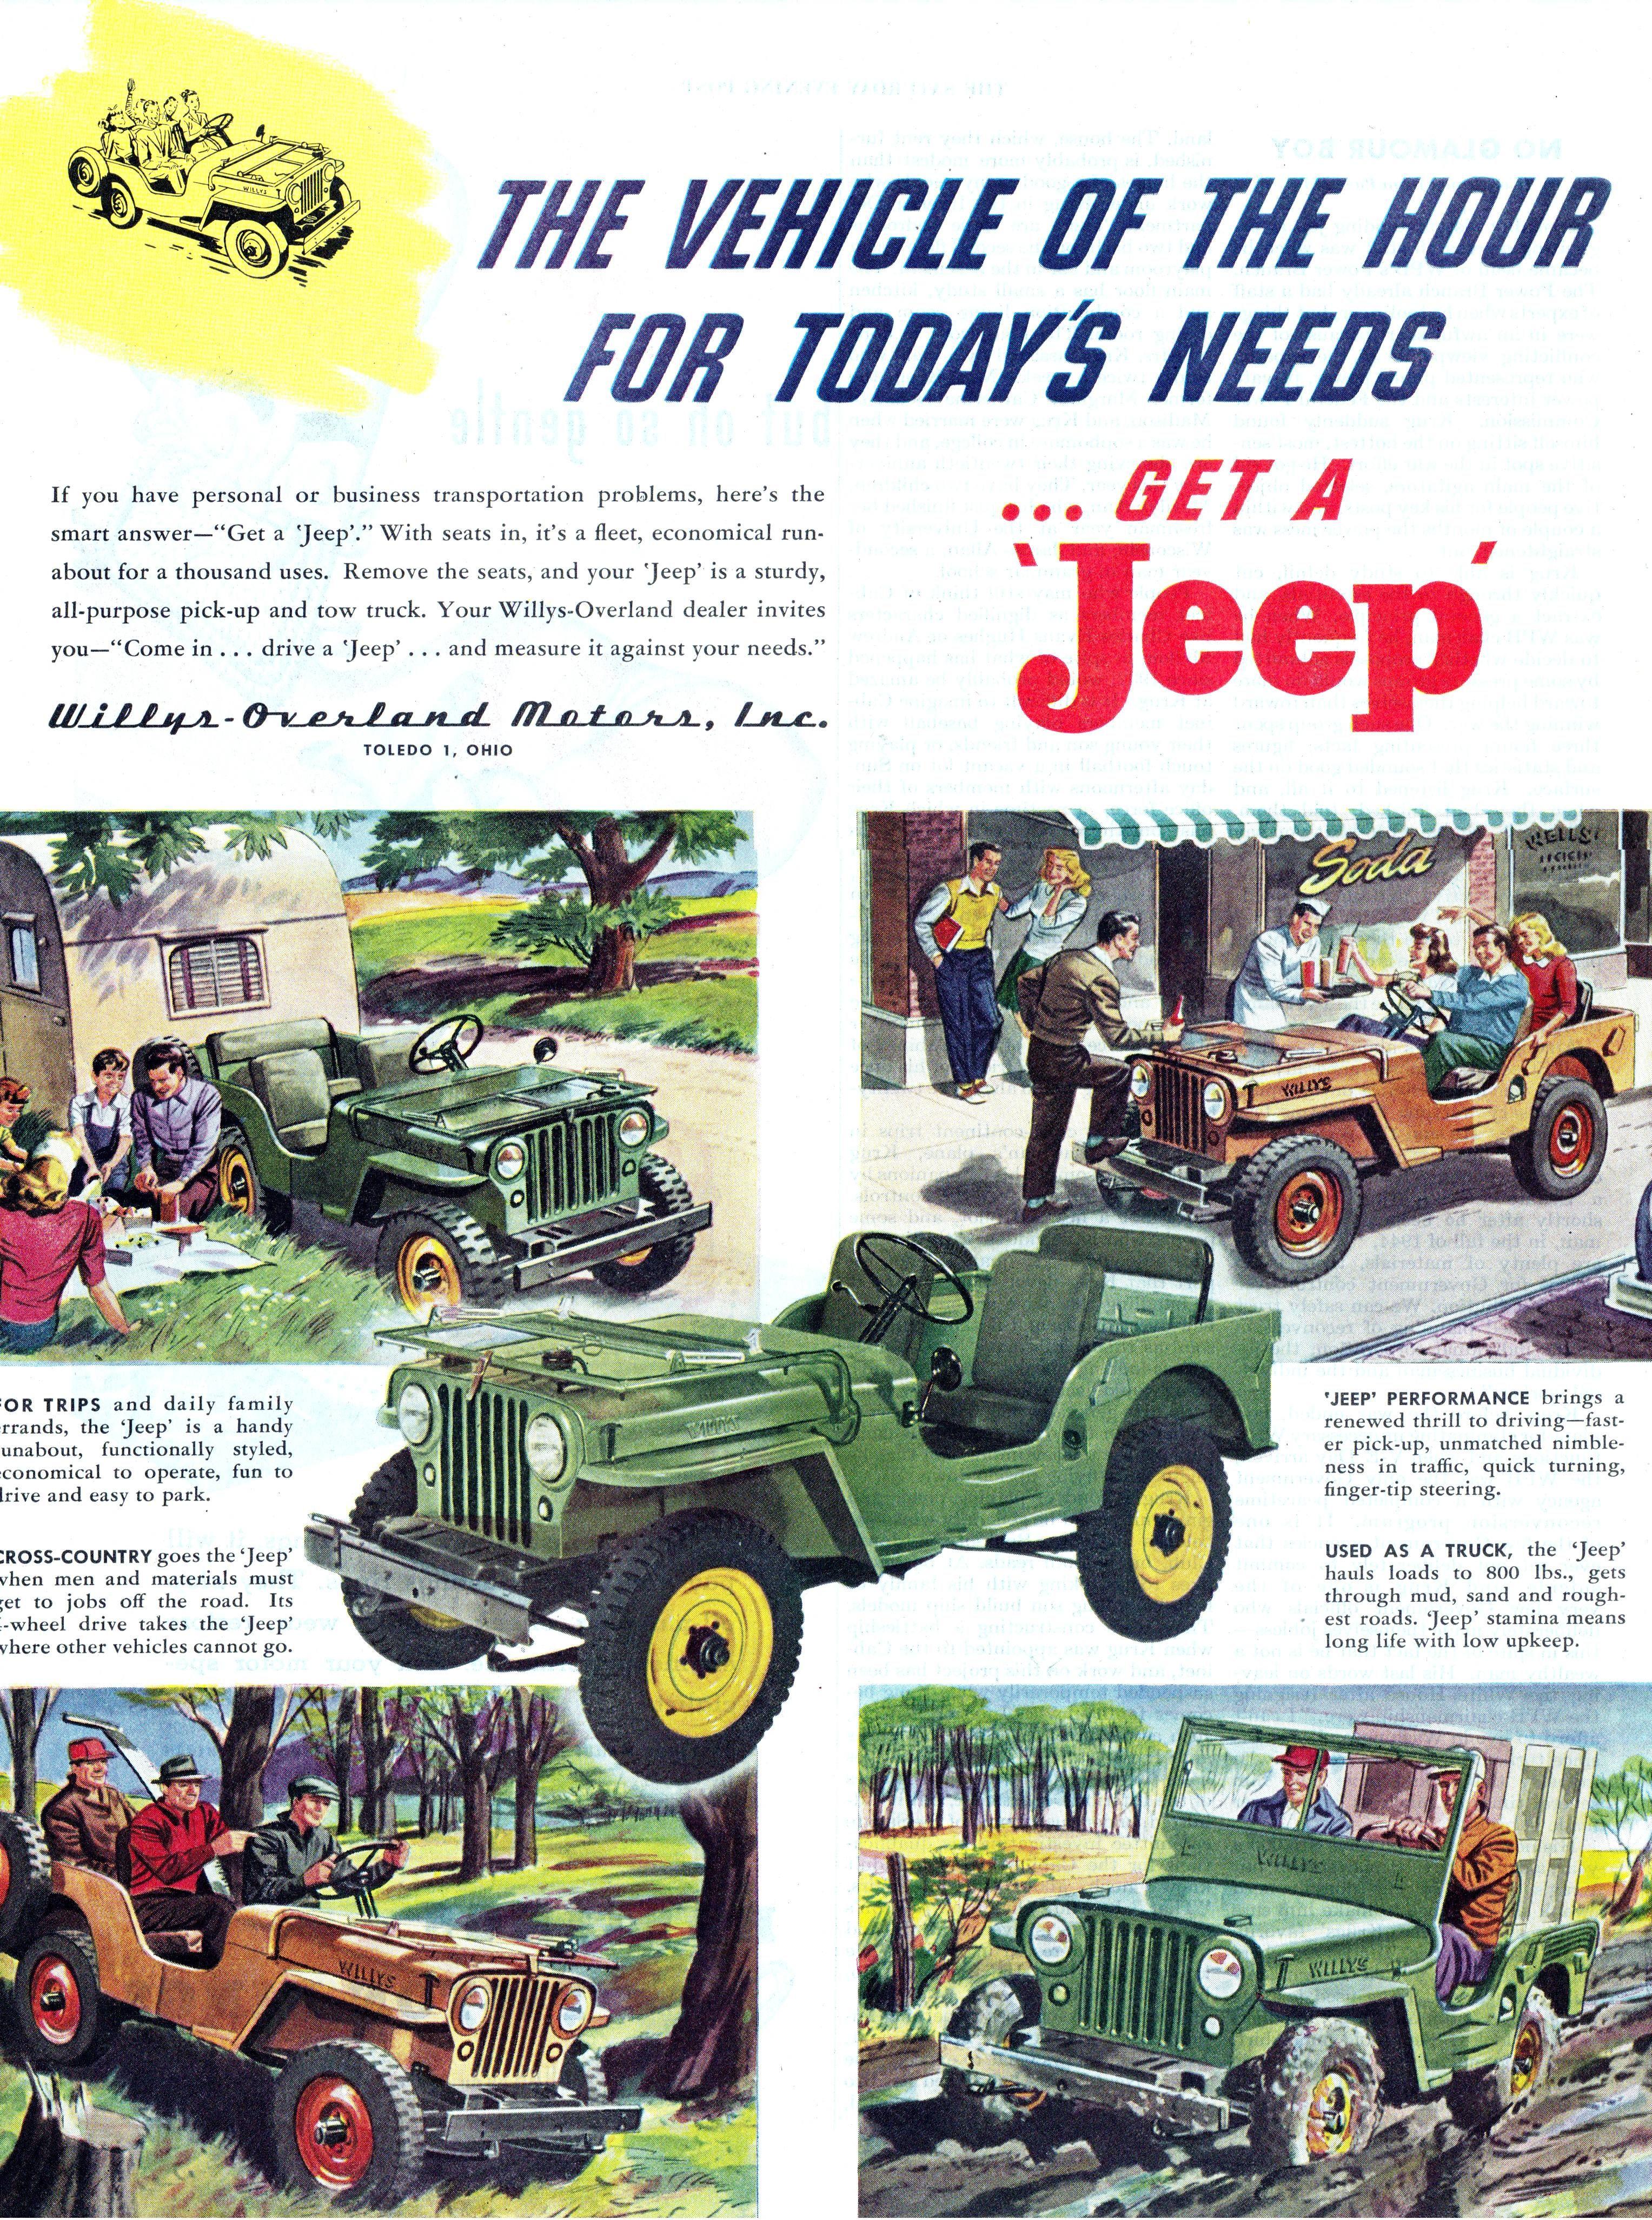 Classic Jeep Cj 2a Advertisement Get A Jeep Manassas Lindsay Manassas Chrysler Dodge Jeep Ram Willys Jeep Jeep Jeep Cj